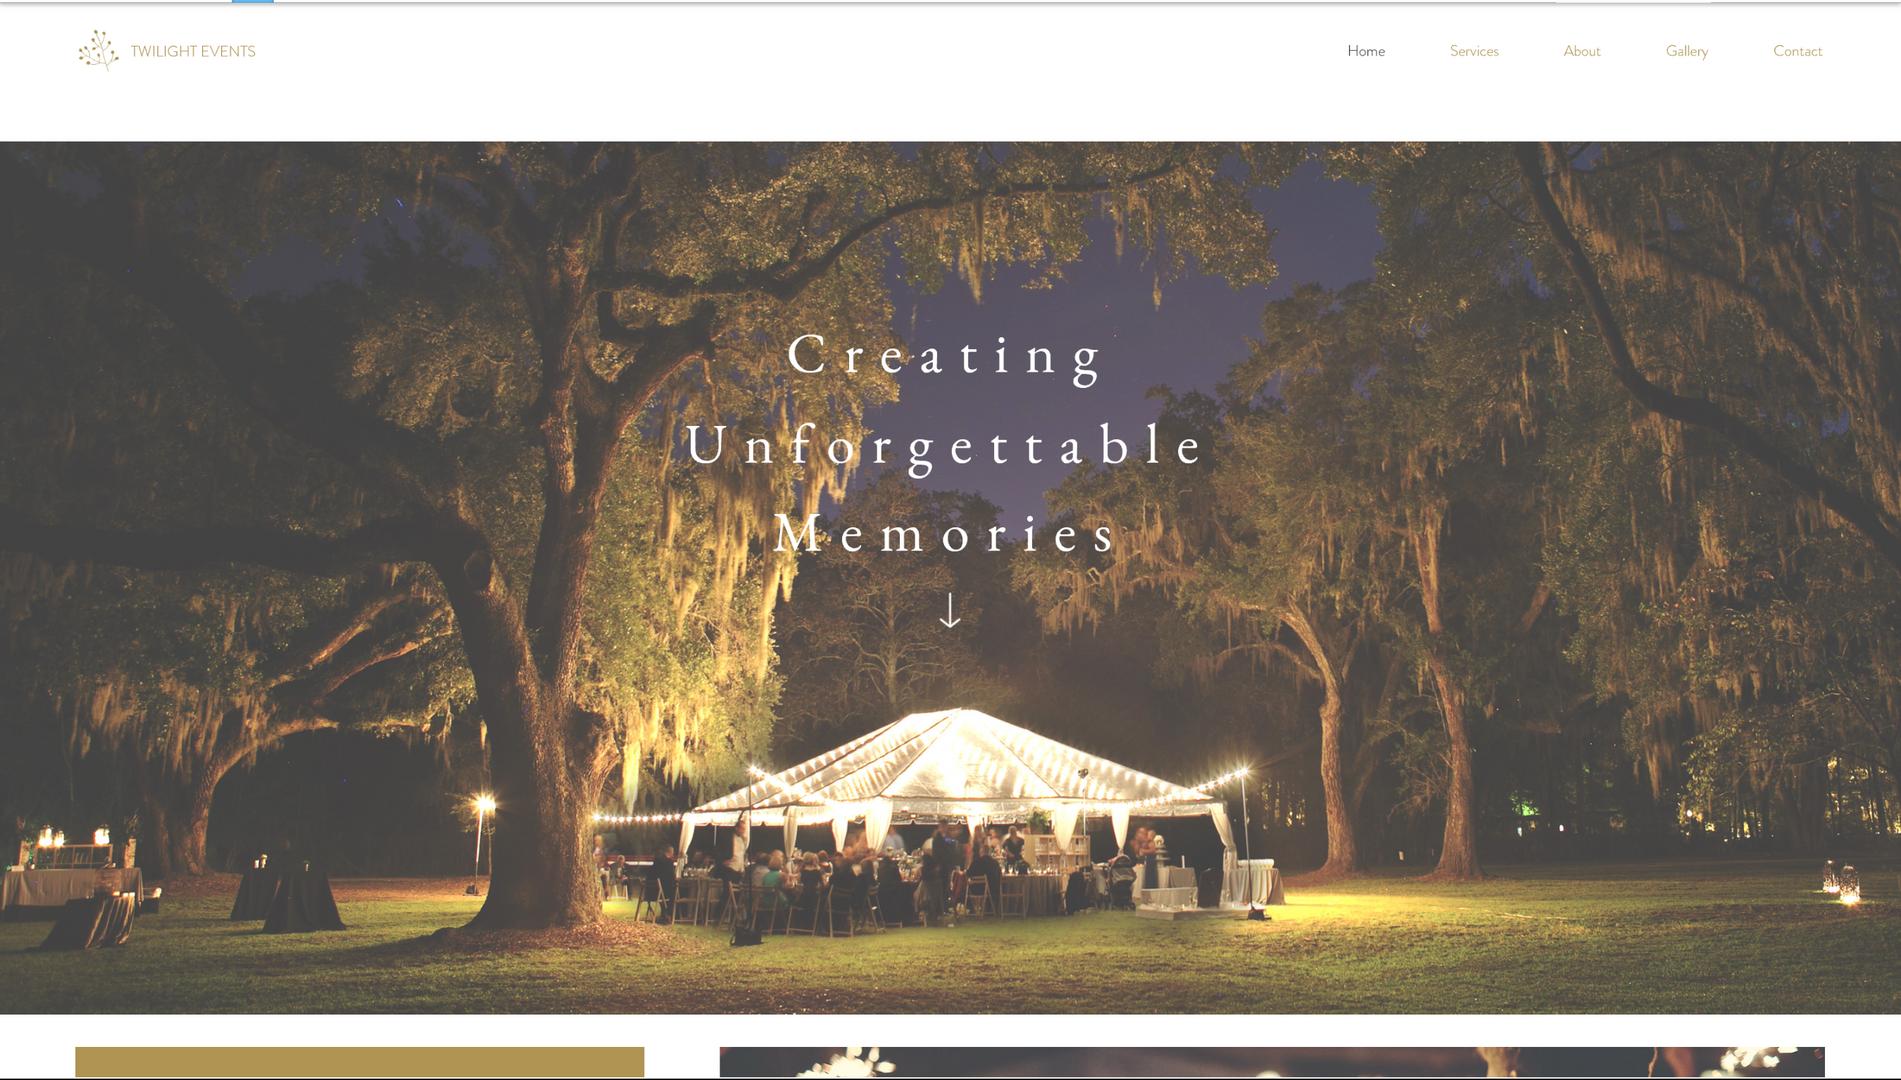 event planners sample website header.png